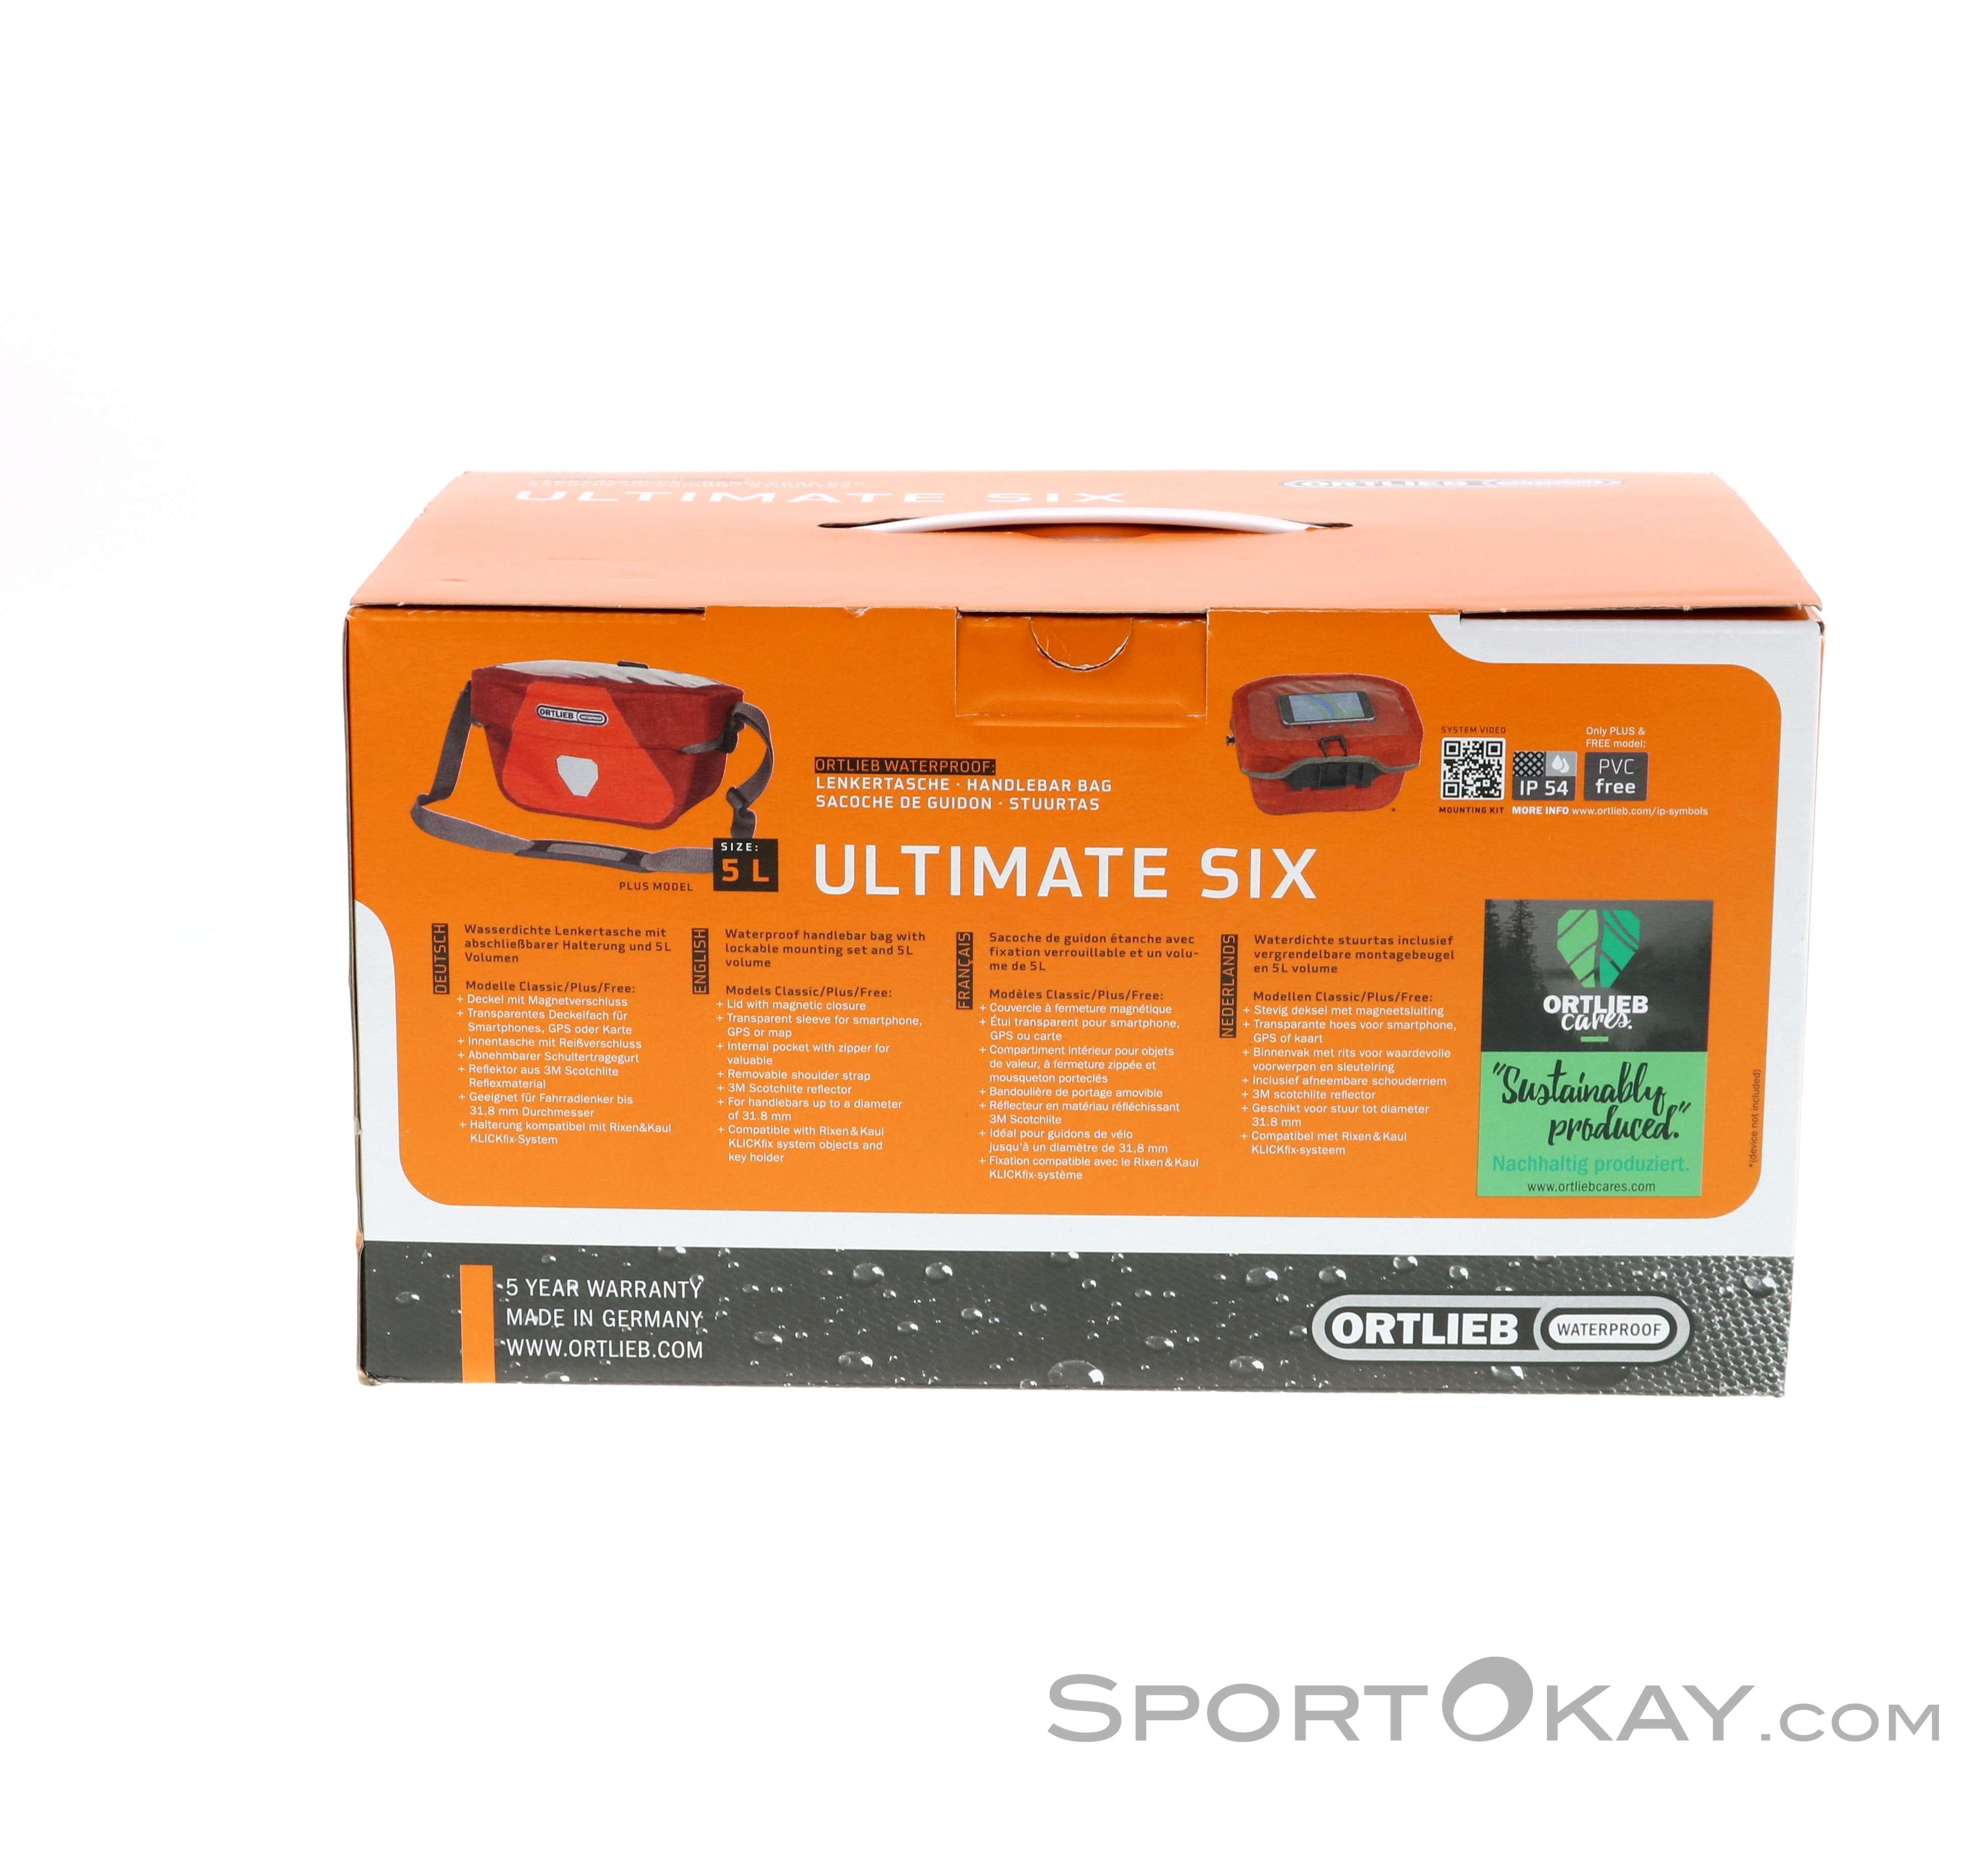 Ortlieb Ultimate Six S Classic 5l Bike Bag